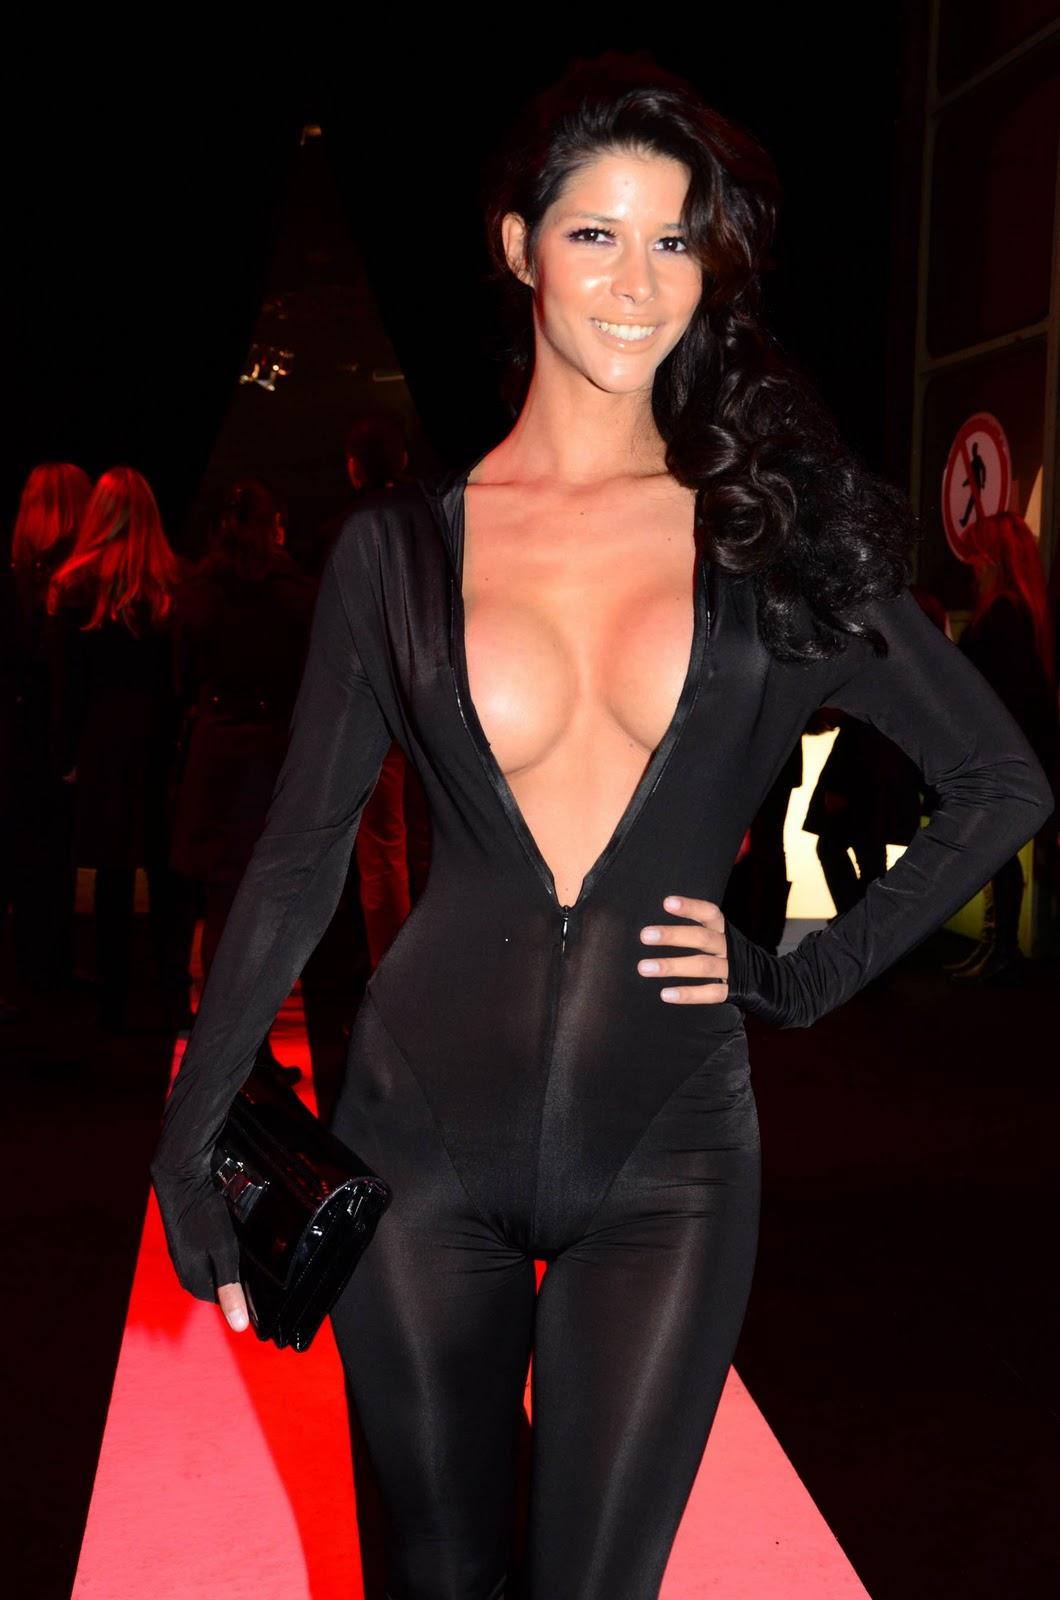 Micaela Schaefer Nipple Slip And Exposing Full Cleavage In